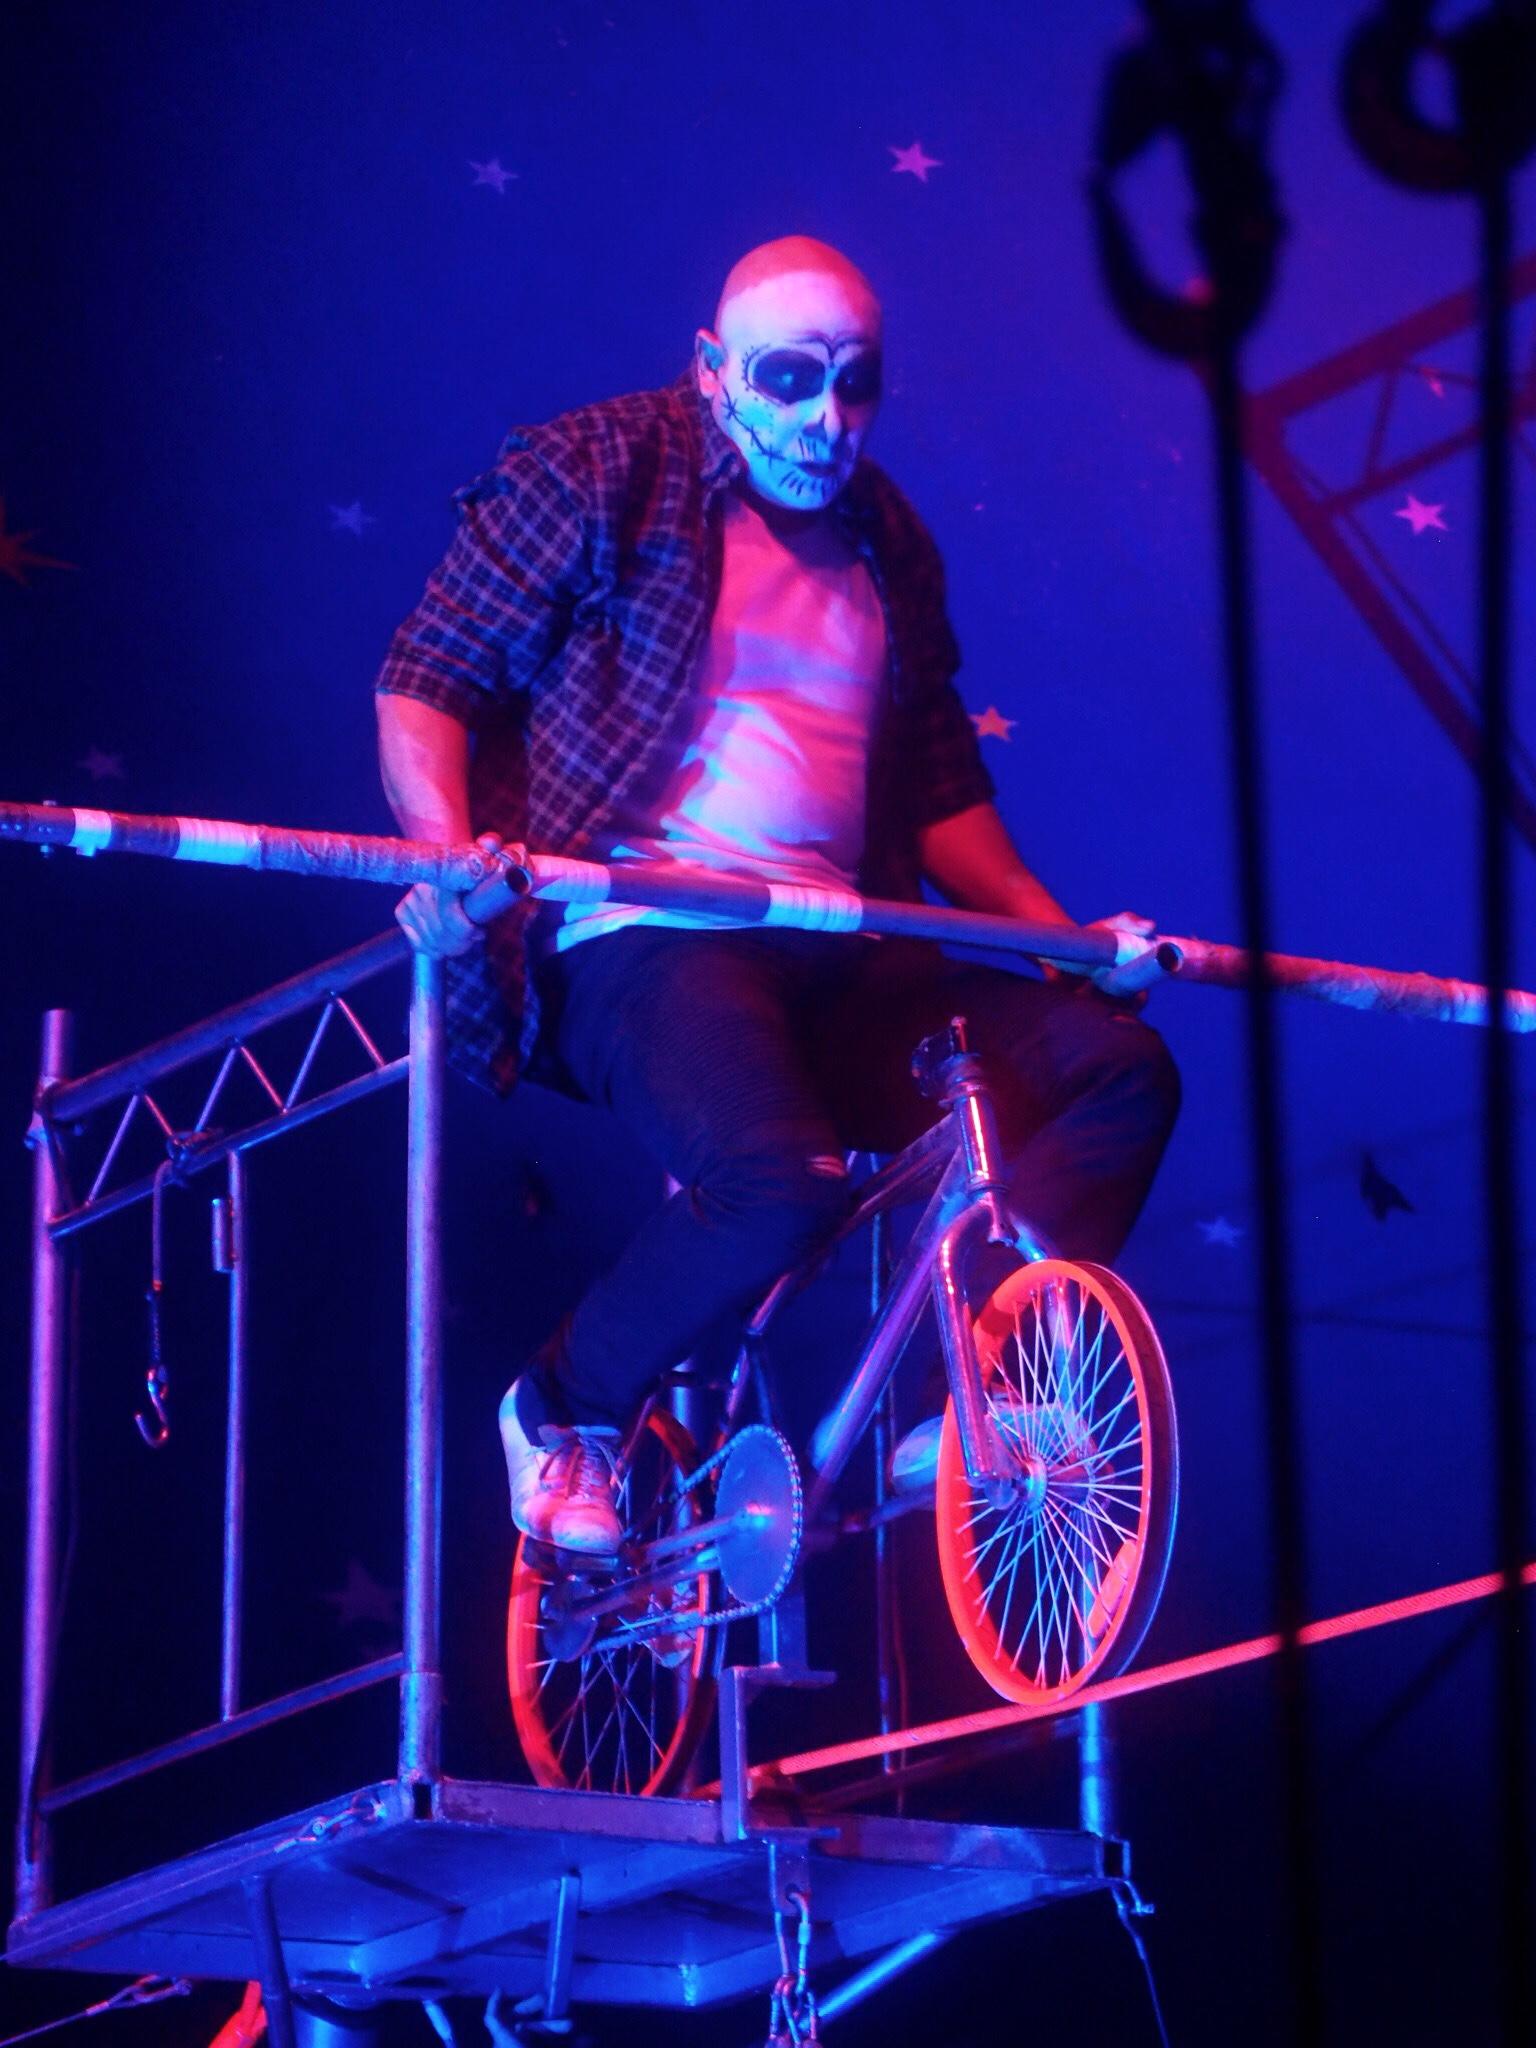 The paulos circus